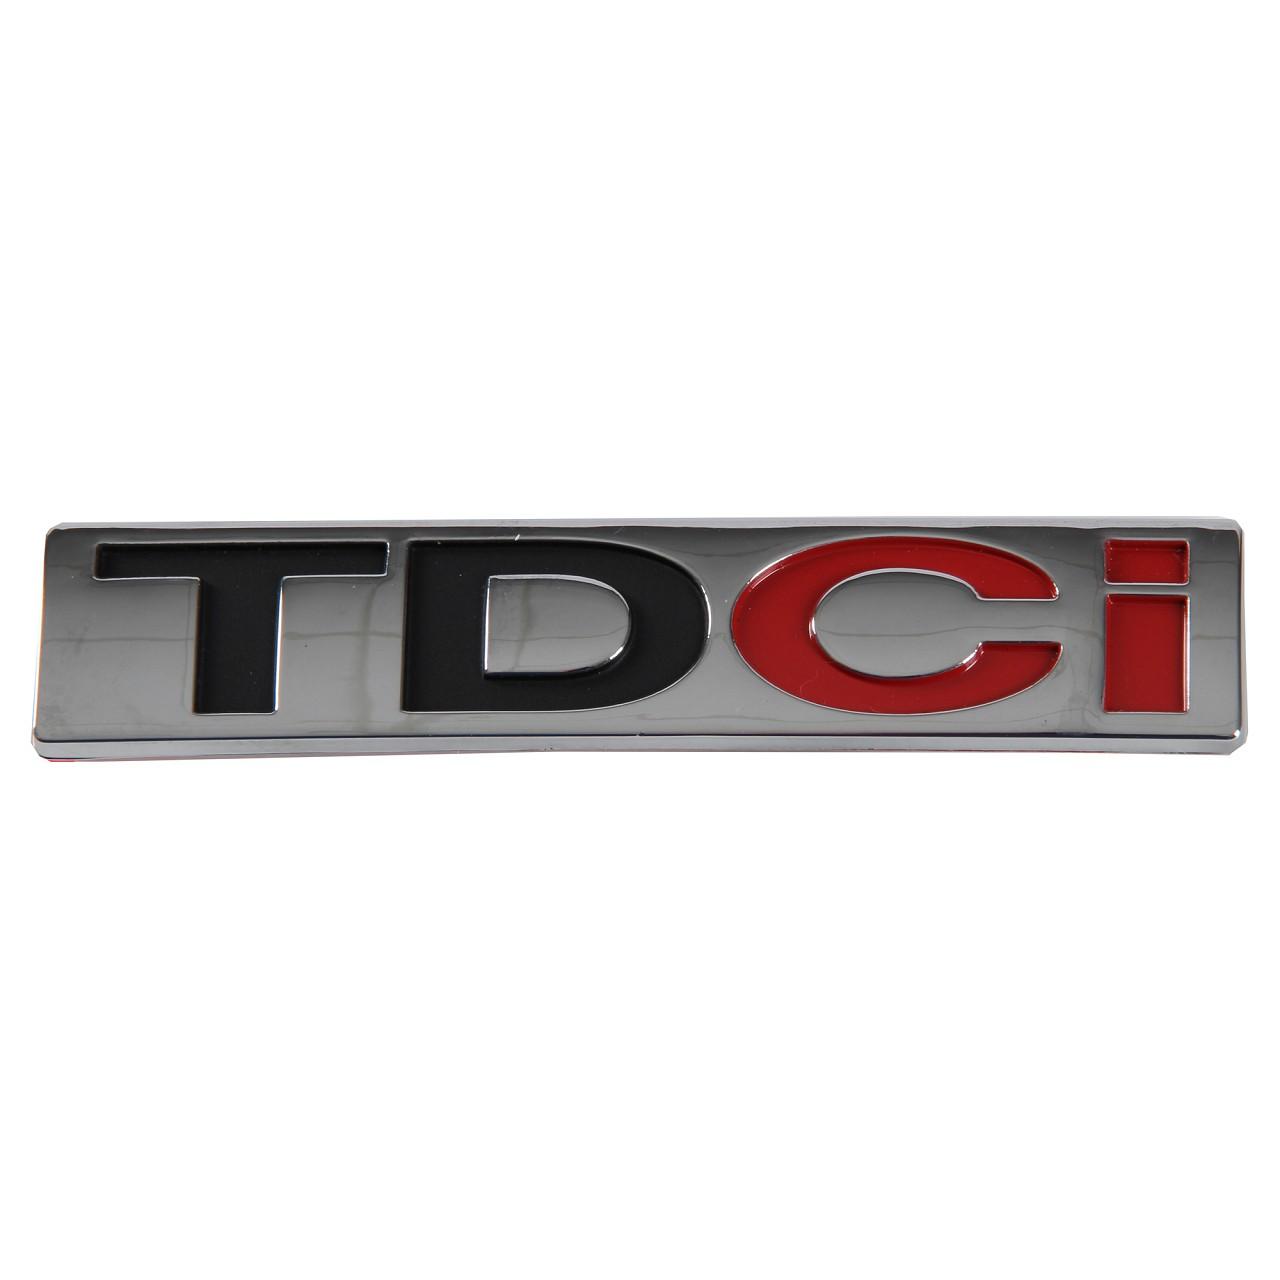 "ORIGINAL Ford Emblem Schriftzug ""TDCi"" 1375710 für FIESTA FOCUS GALAXY MONDEO"